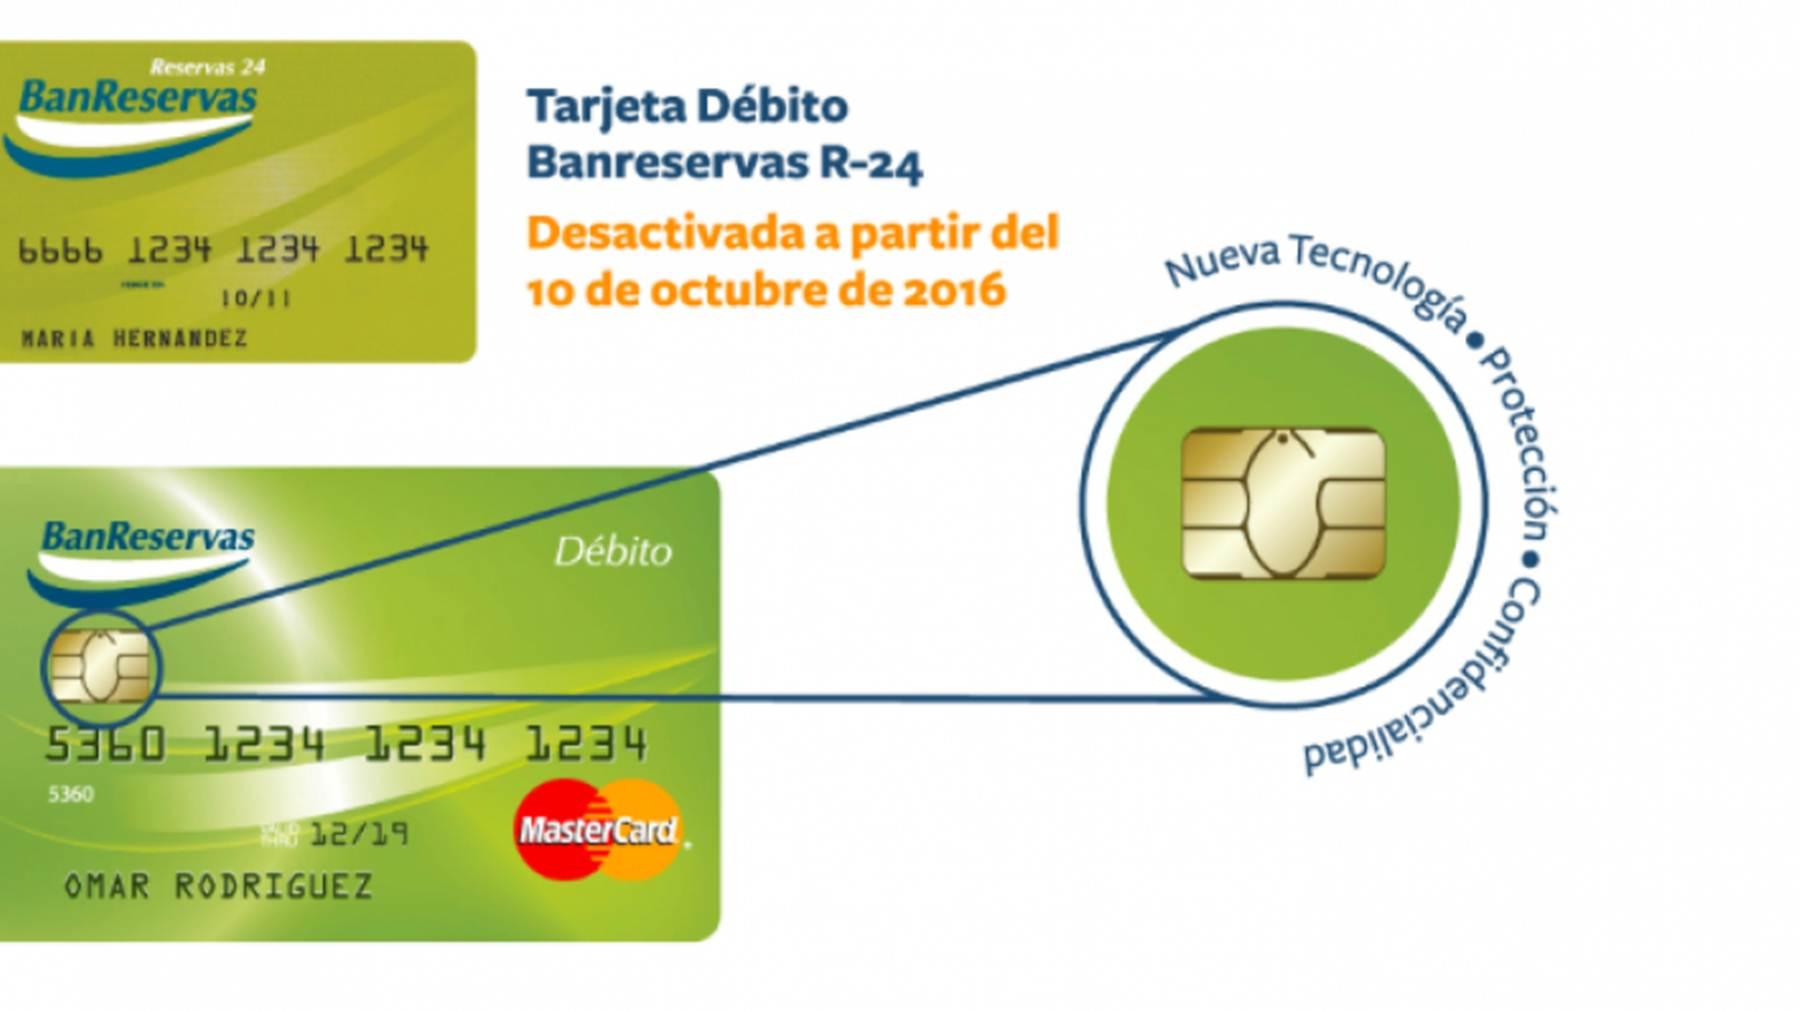 tarjeta de crédito euro flaco